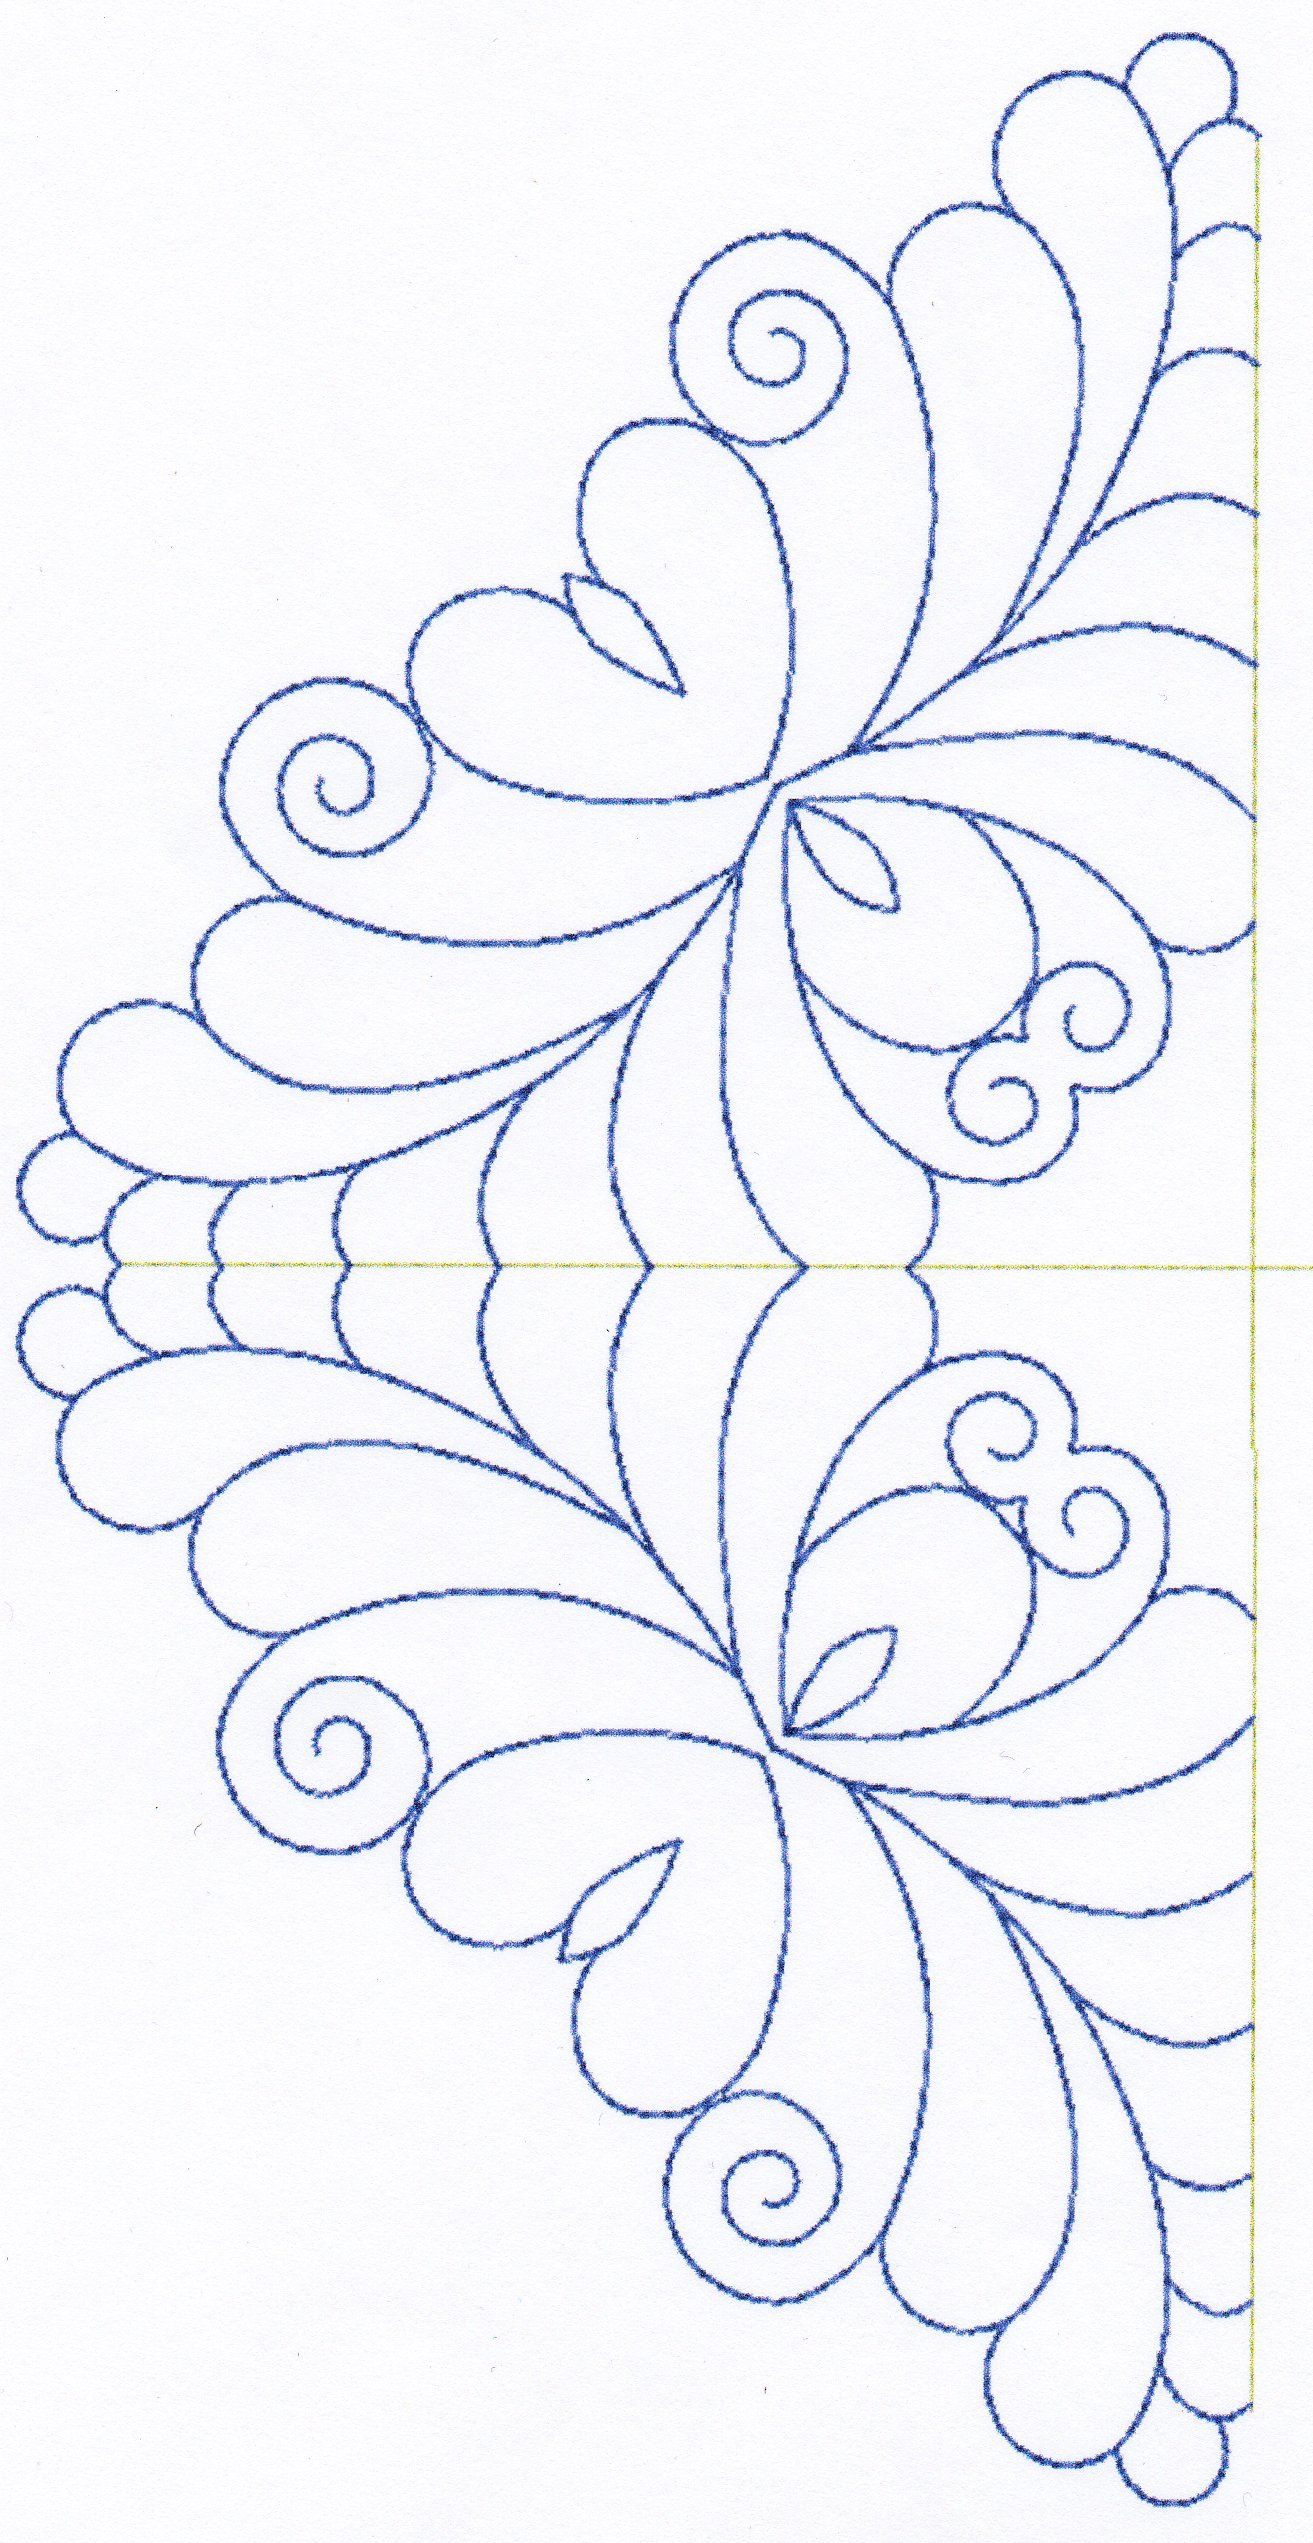 Feather Quilting Designs Set 6 | stepelő minták | Pinterest ... : feather quilting designs - Adamdwight.com